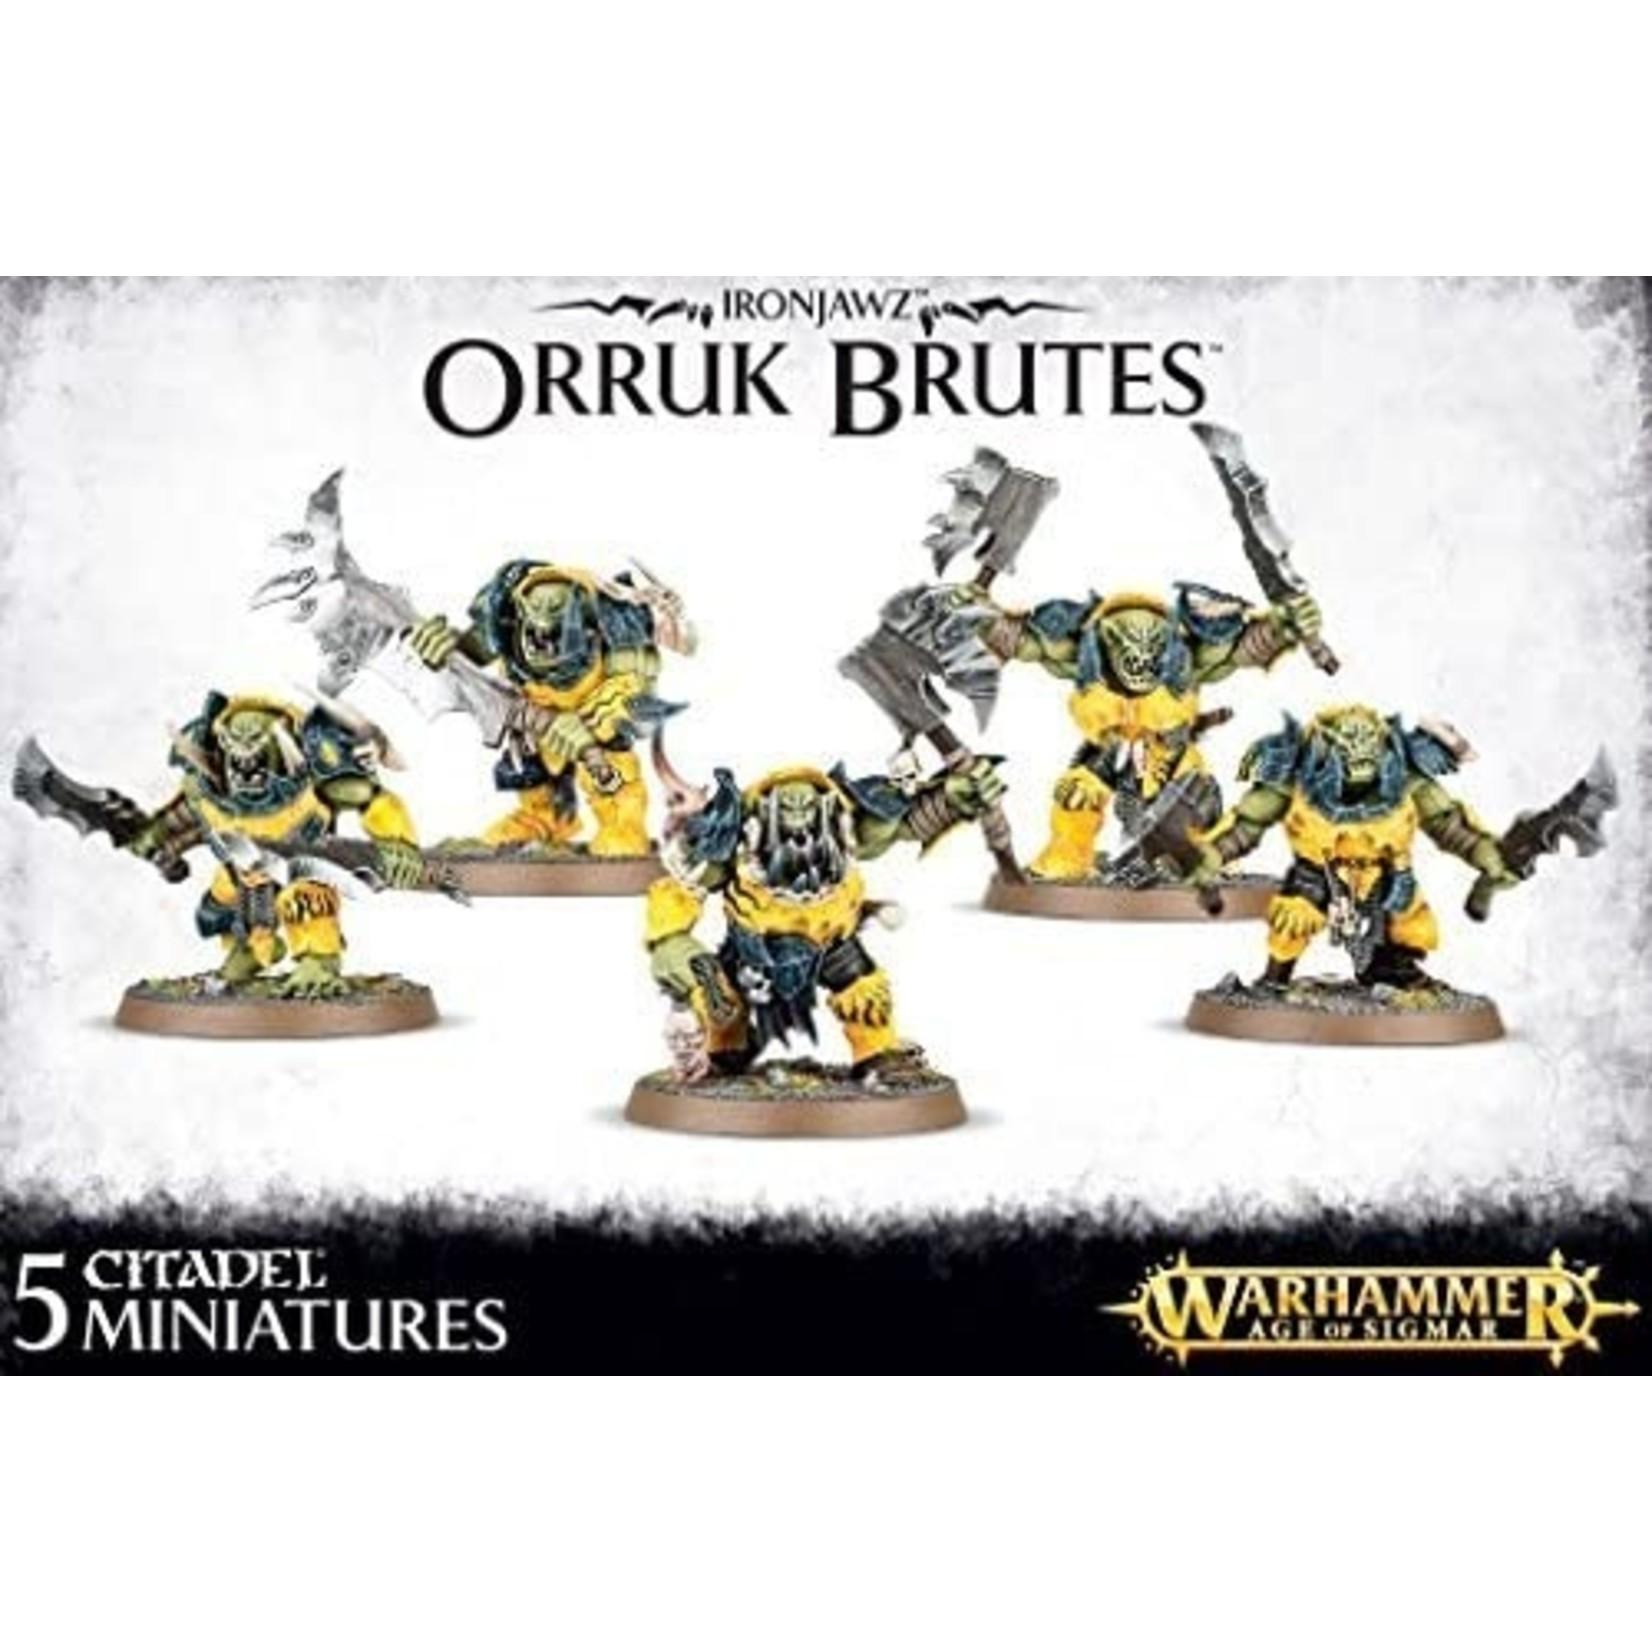 Games Workshop Warhammer Age of Sigmar: Ironjawz - Orruk Brutes